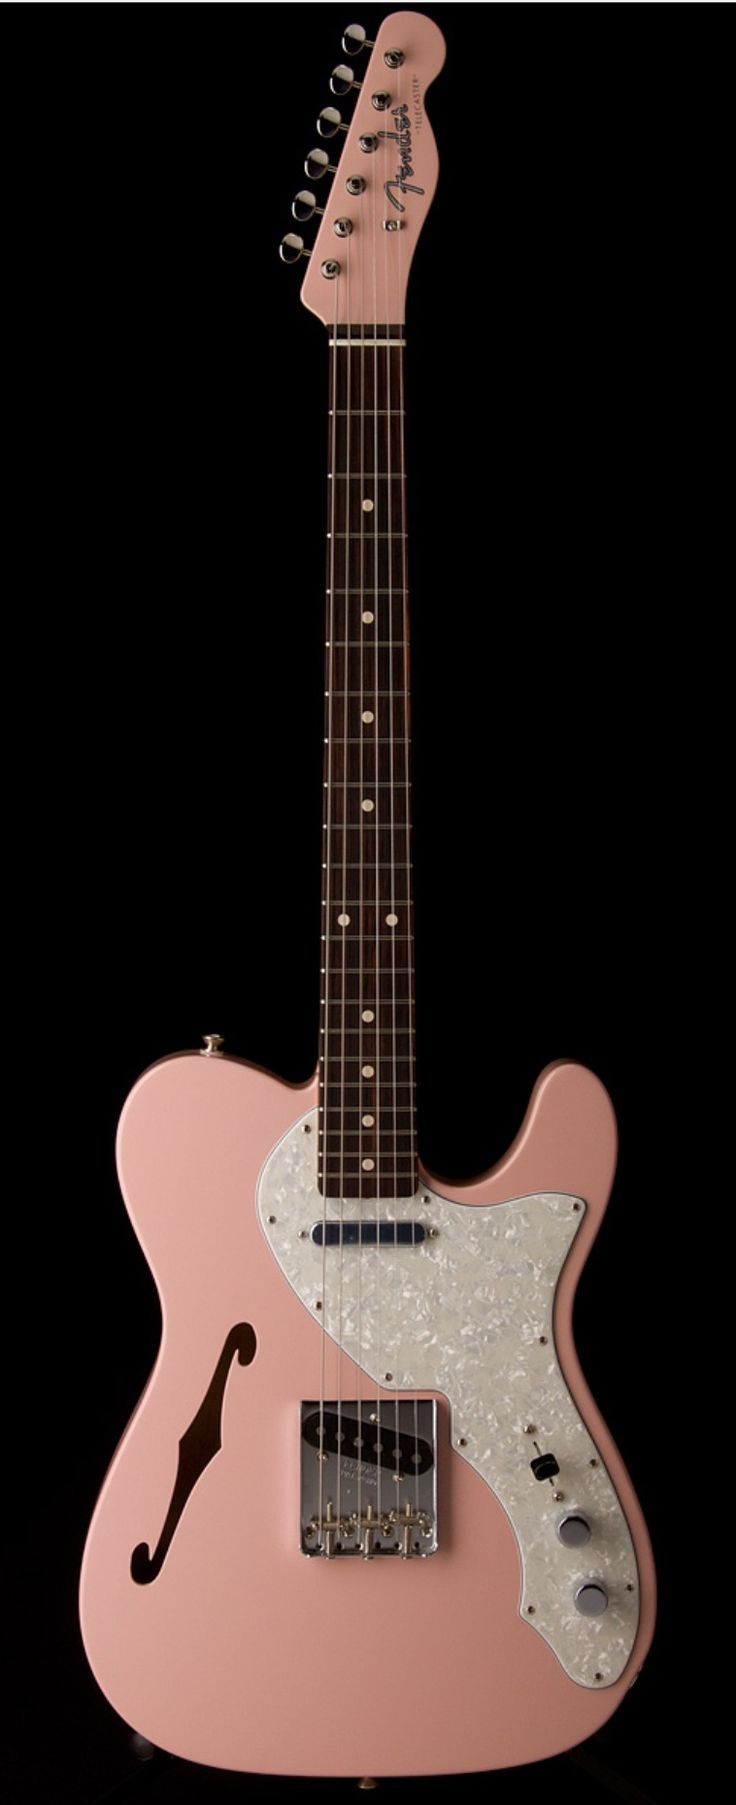 FENDER Master Built 1960 Thinline Telecaster  Shell Pink by Yuriy Shishkov | Guitar Center